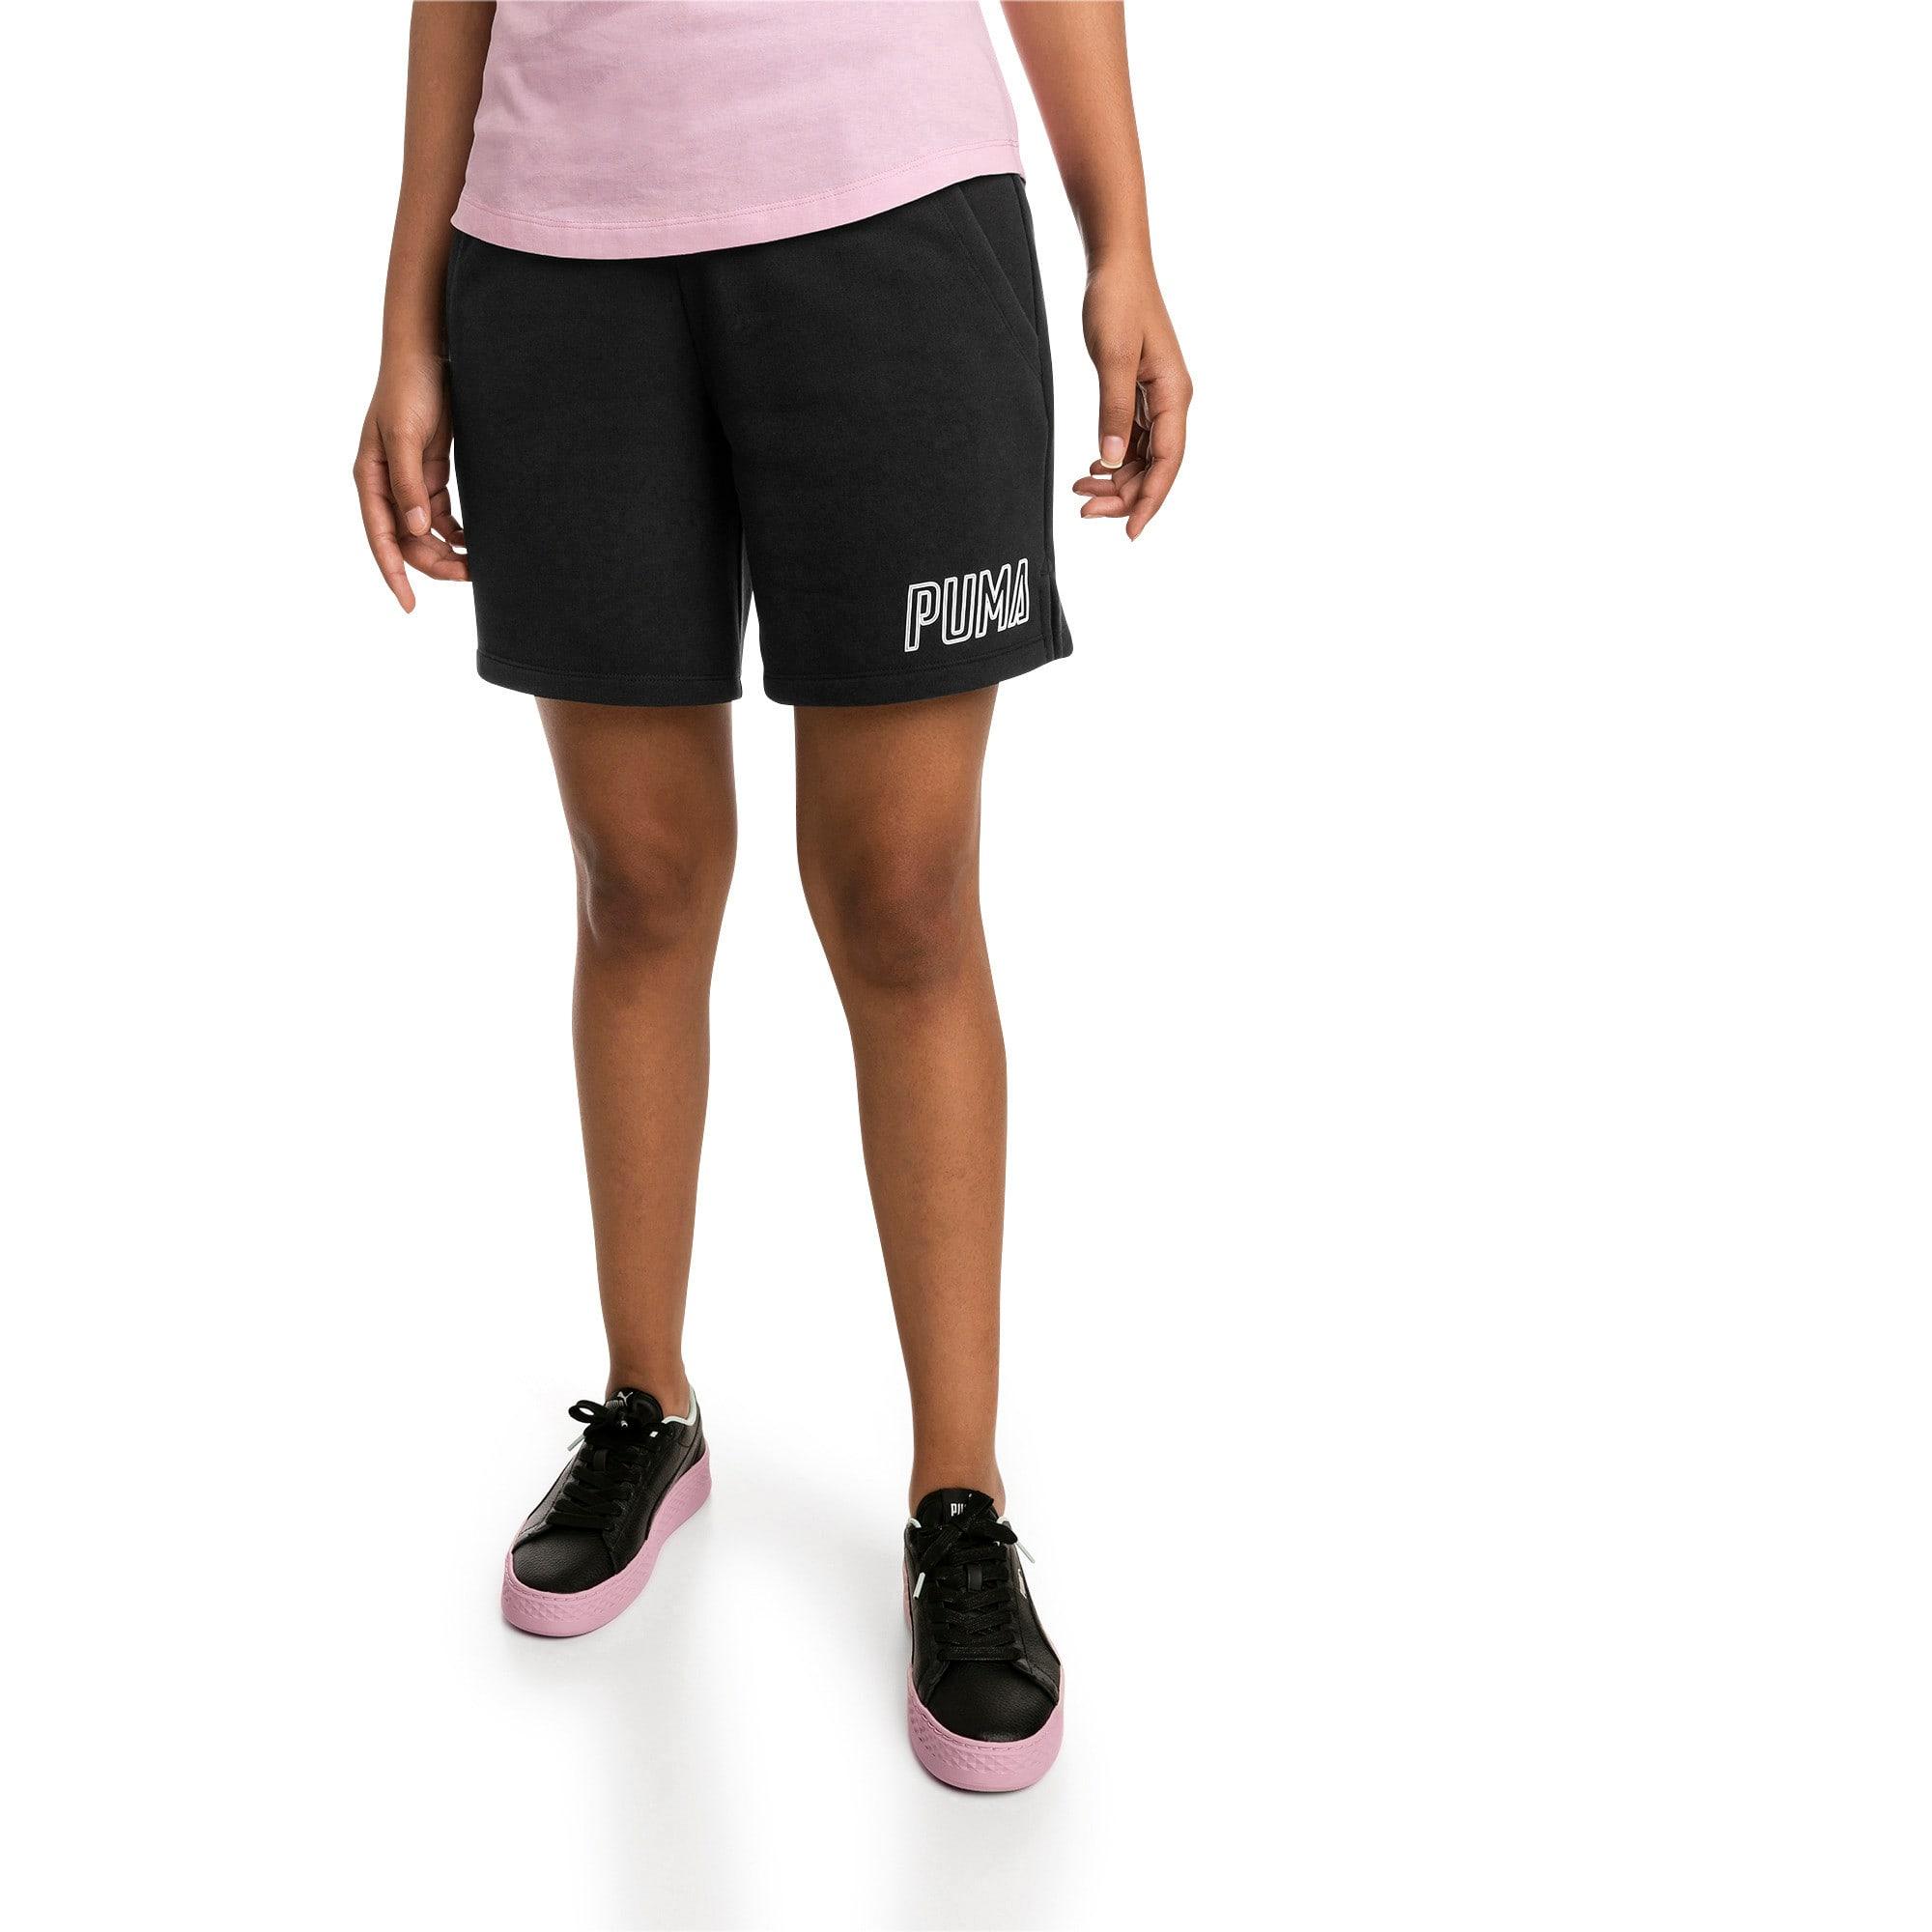 Thumbnail 1 of Athletics Women's Sweat Shorts, Puma Black, medium